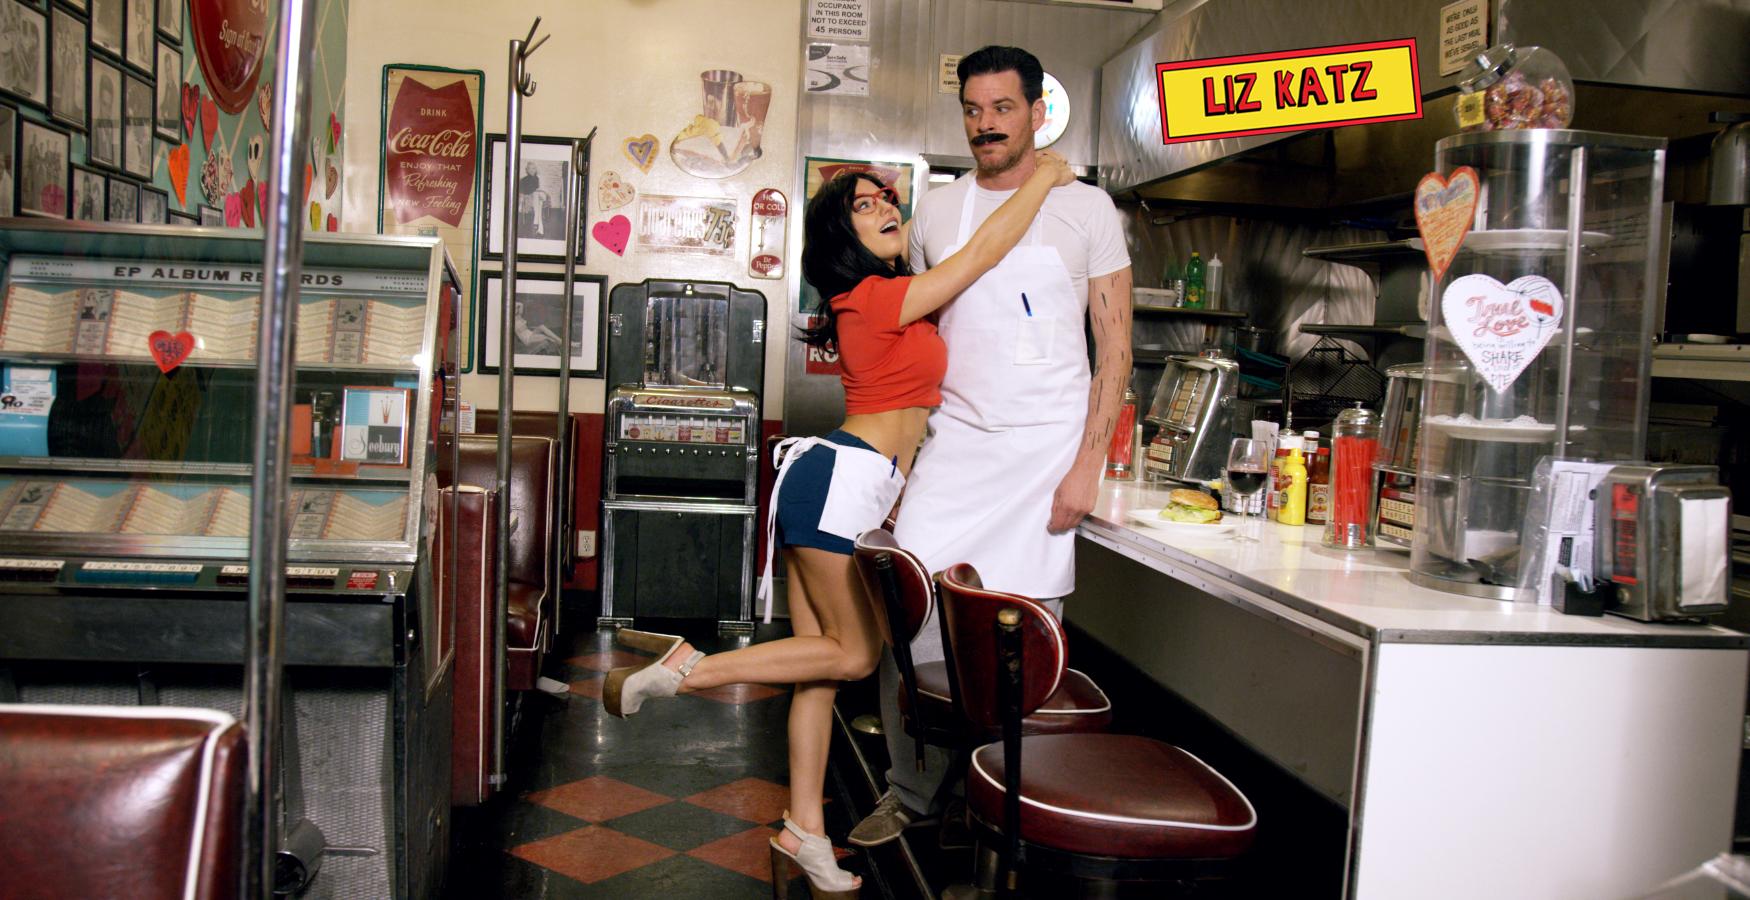 Bob's Burgers Cosplay with Liz Katz and Linda Belcher and Sam Macaroni as Bob